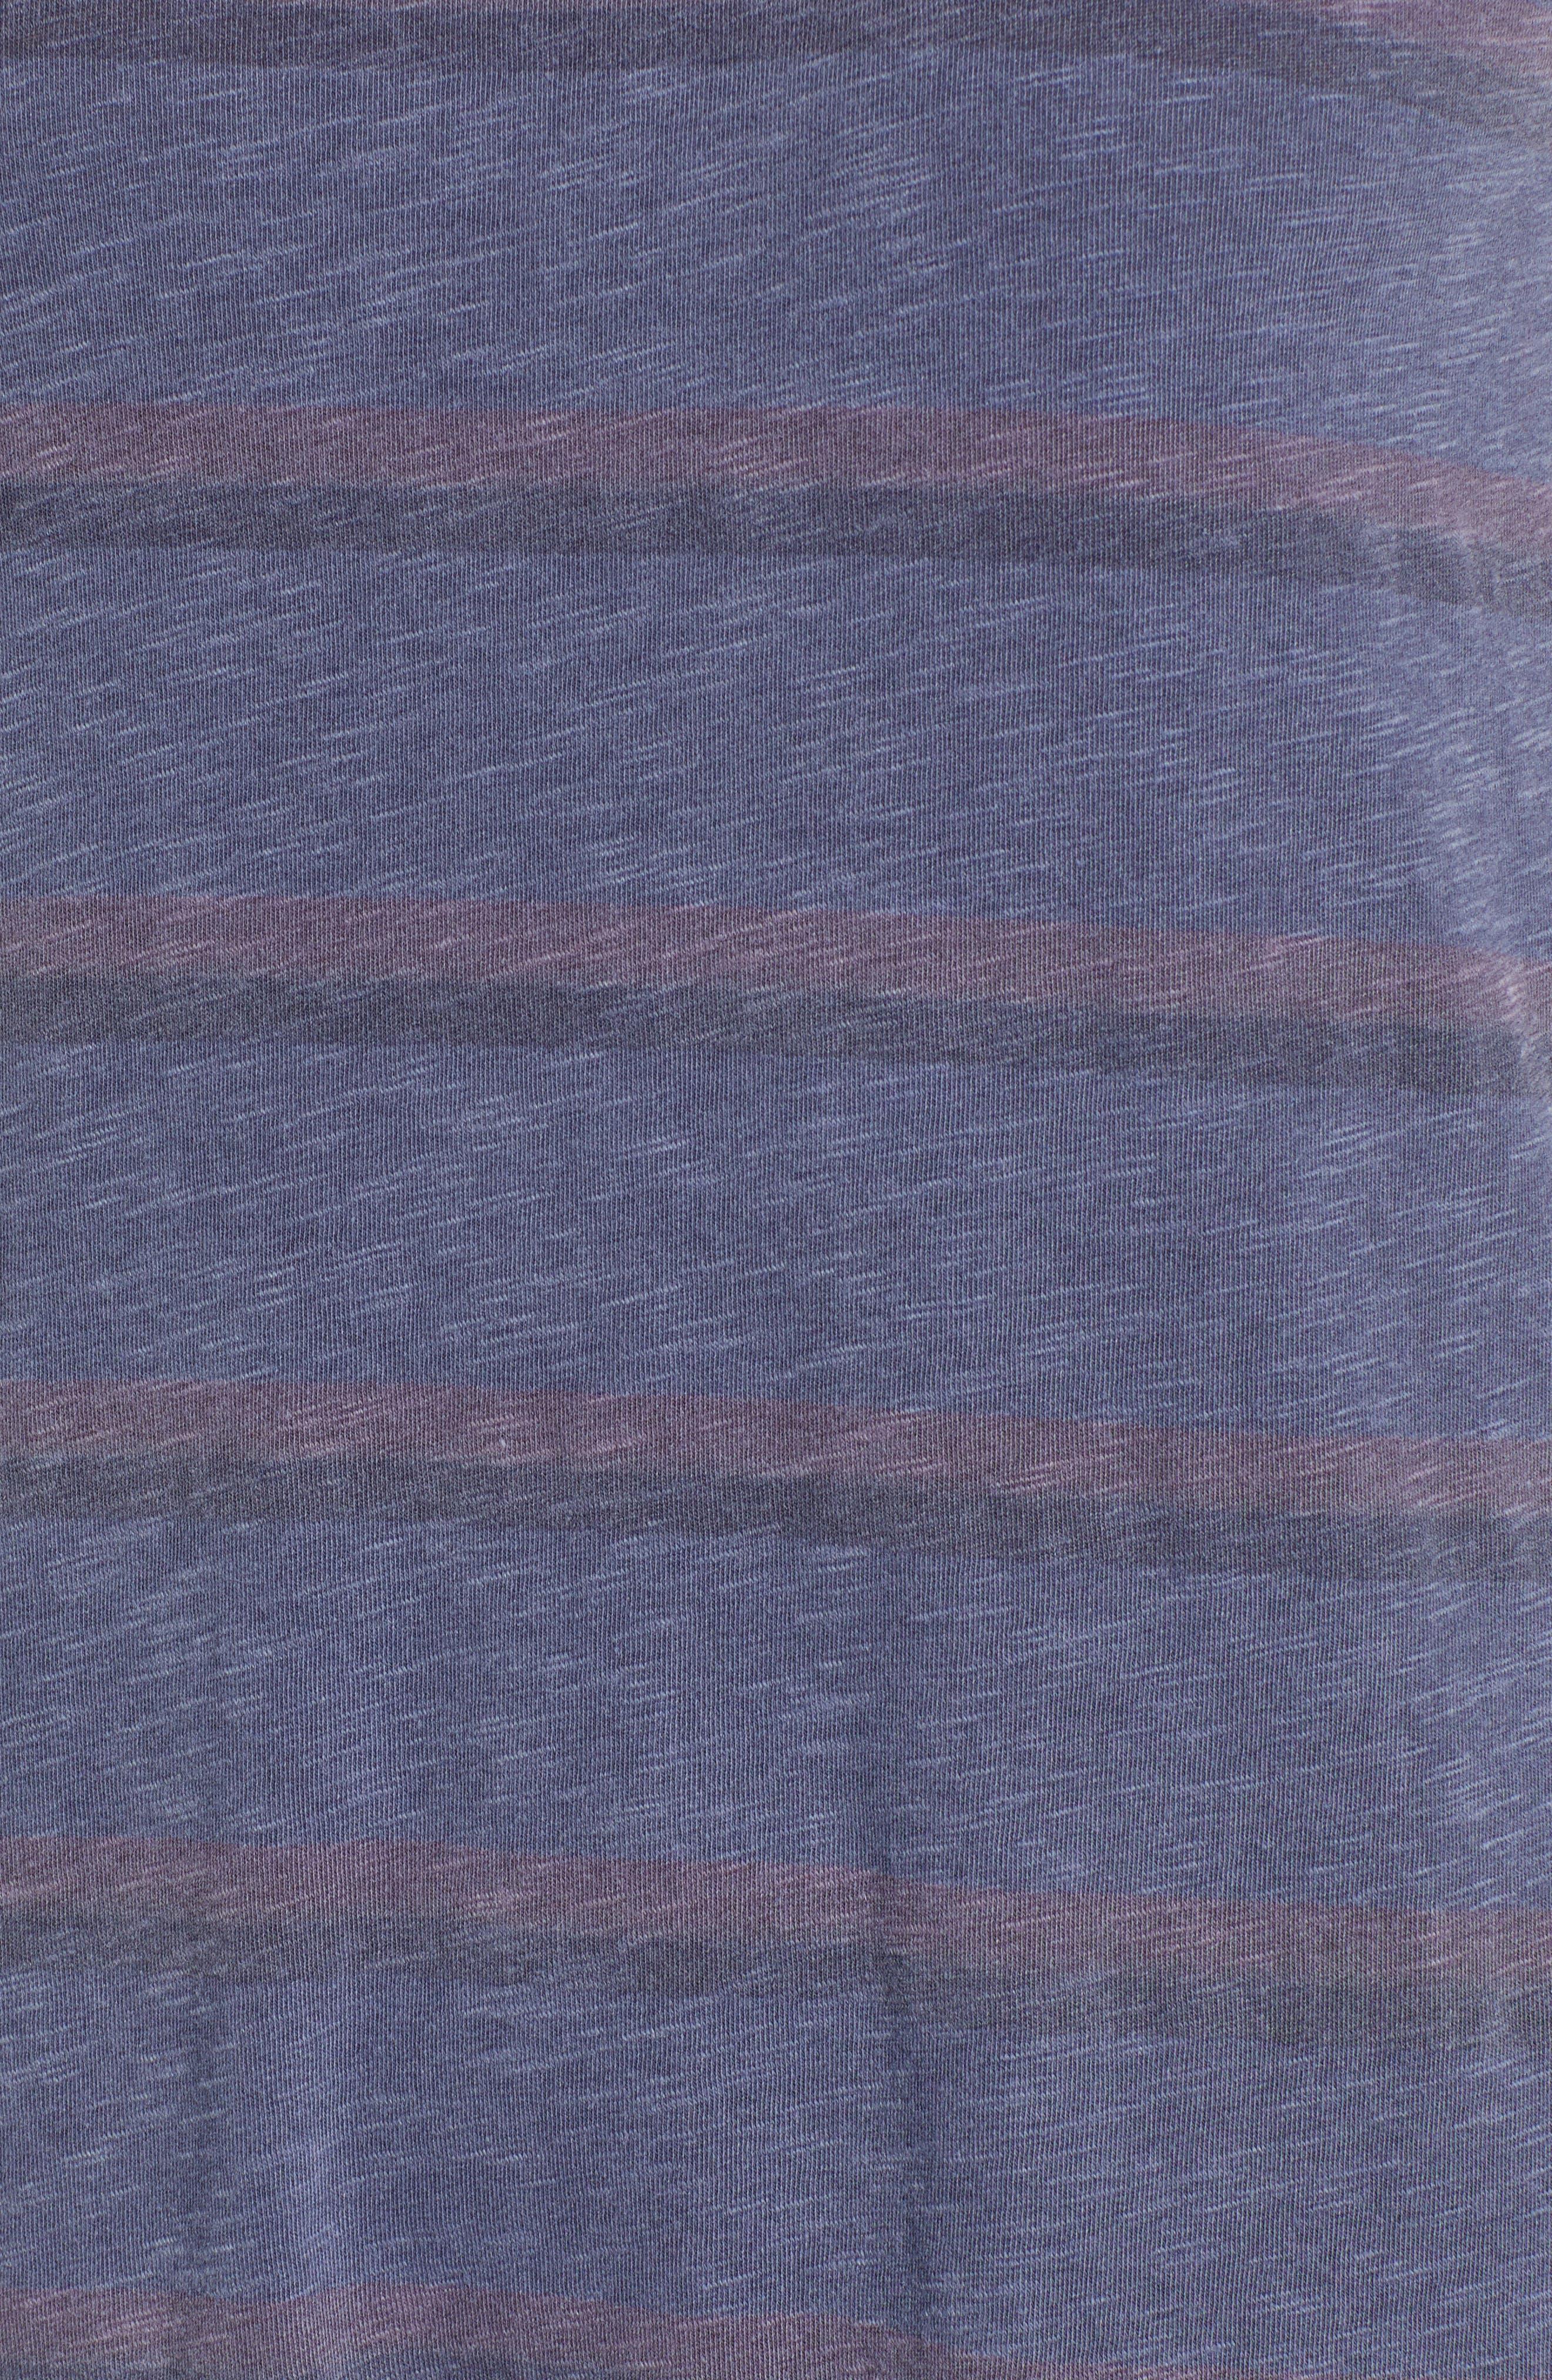 Ruffle Tank Dress,                             Alternate thumbnail 6, color,                             Pigment Navy